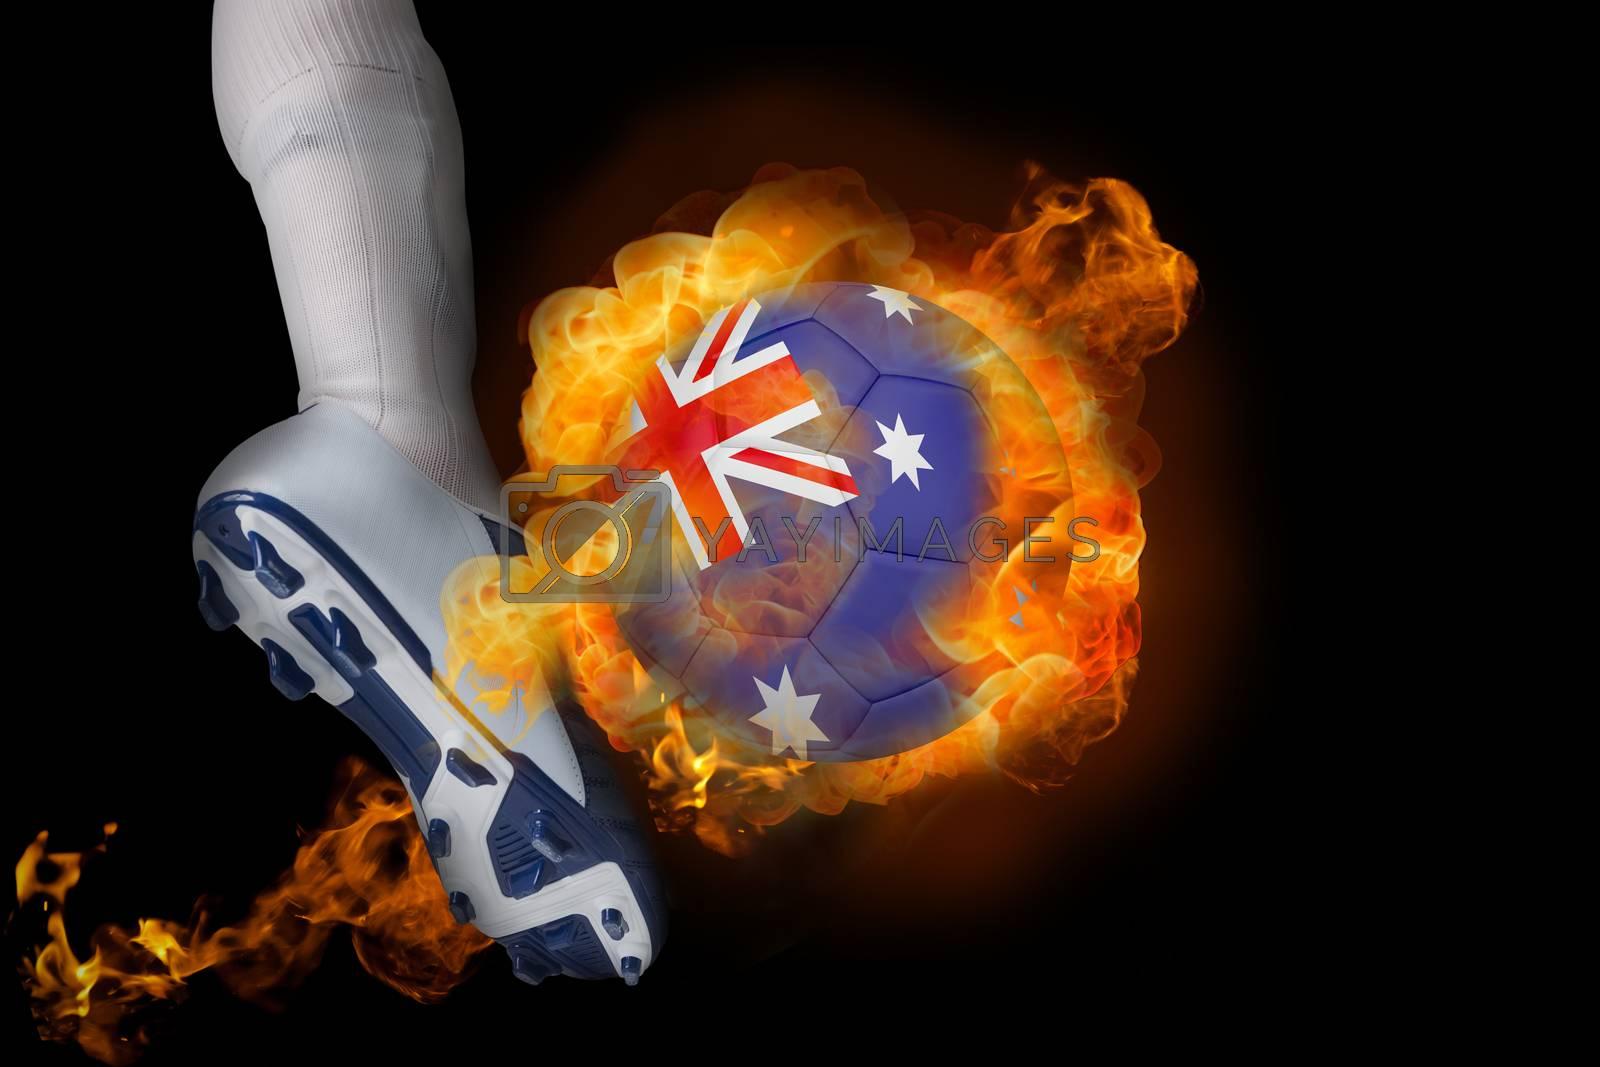 Football player kicking flaming australia ball by Wavebreakmedia